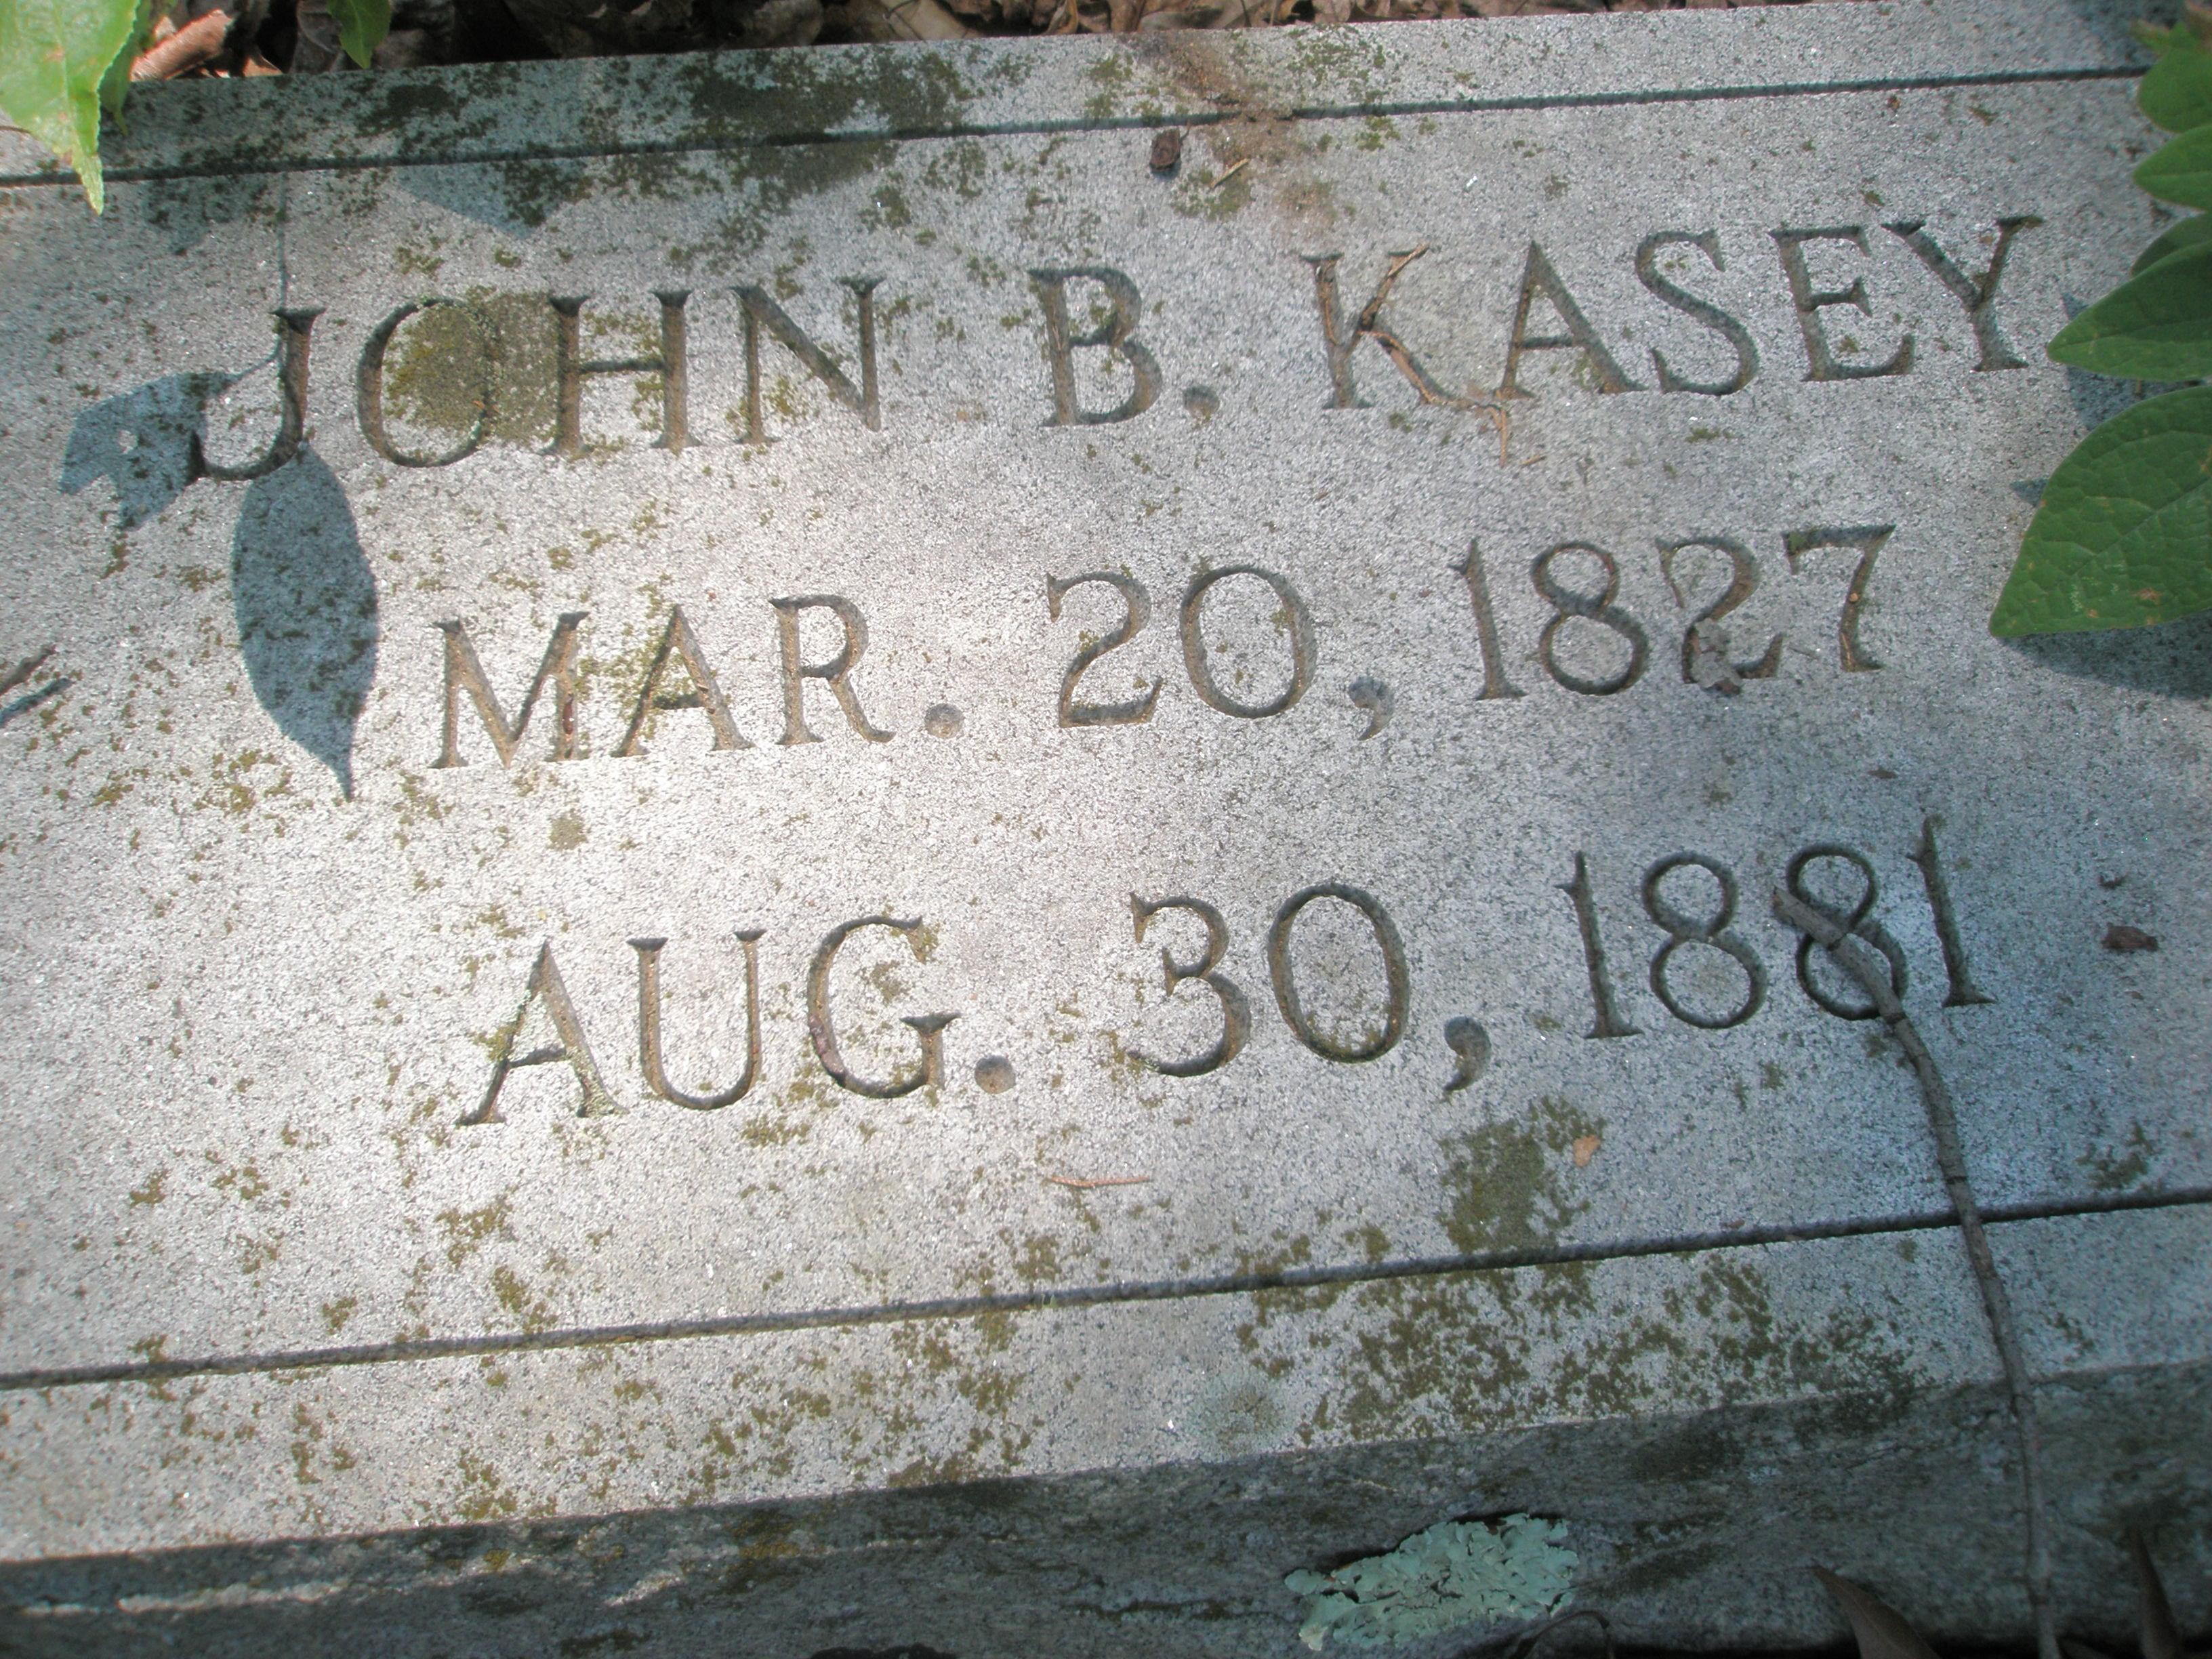 John G Kasey